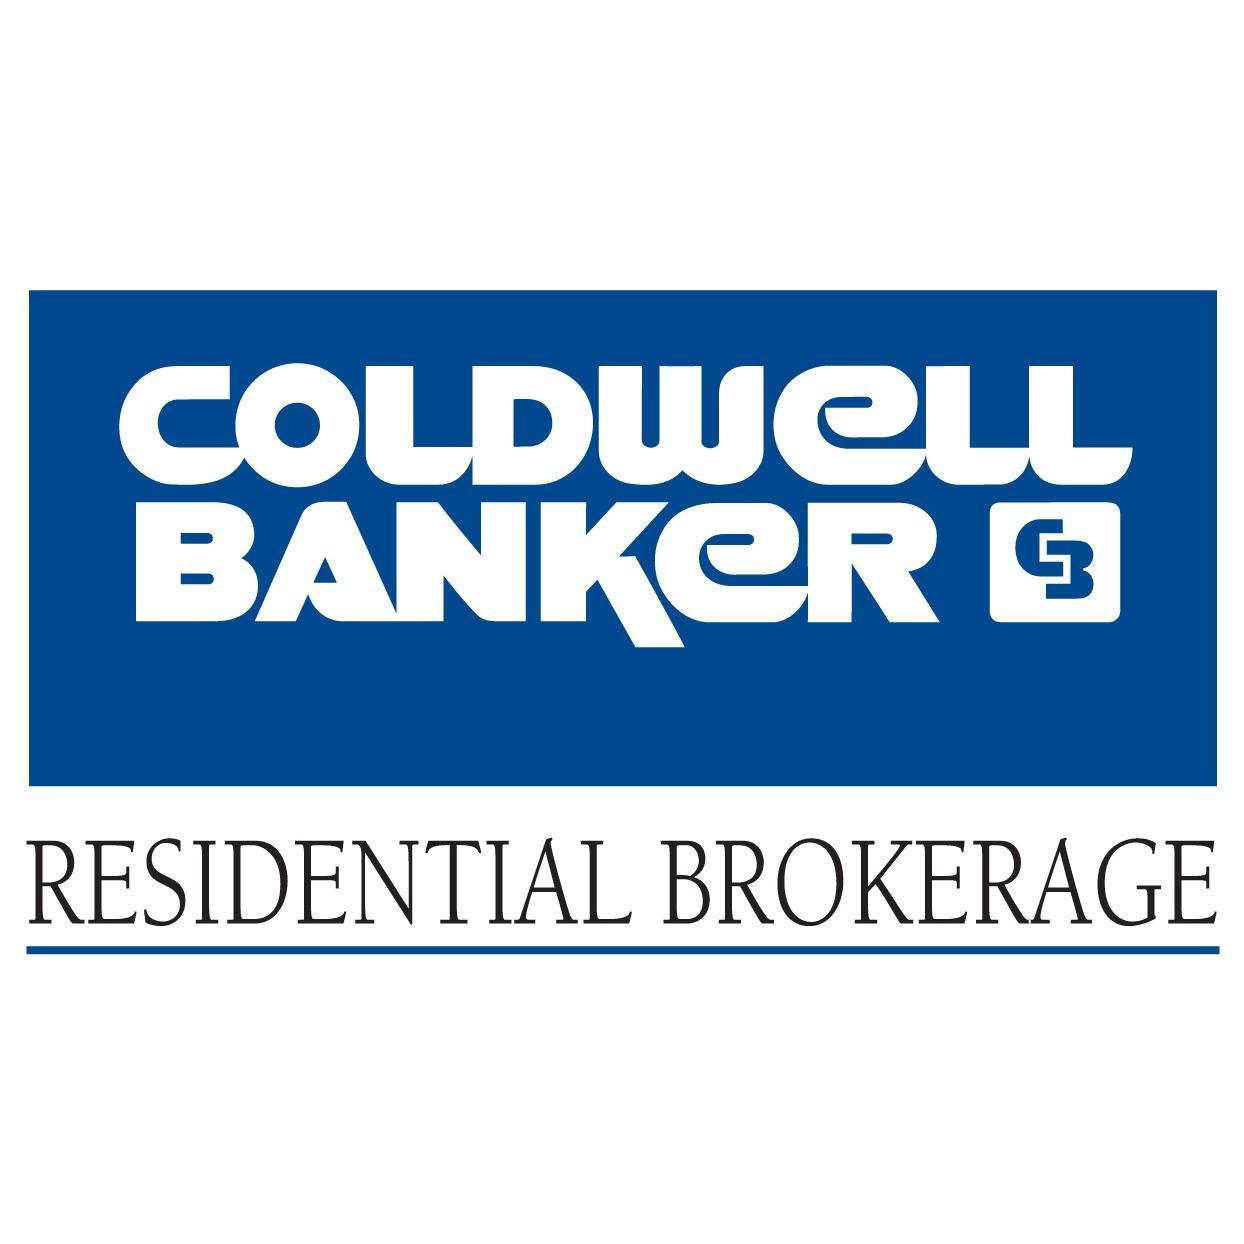 Anthony (Frank) Kelly II | Coldwell Banker/NRT